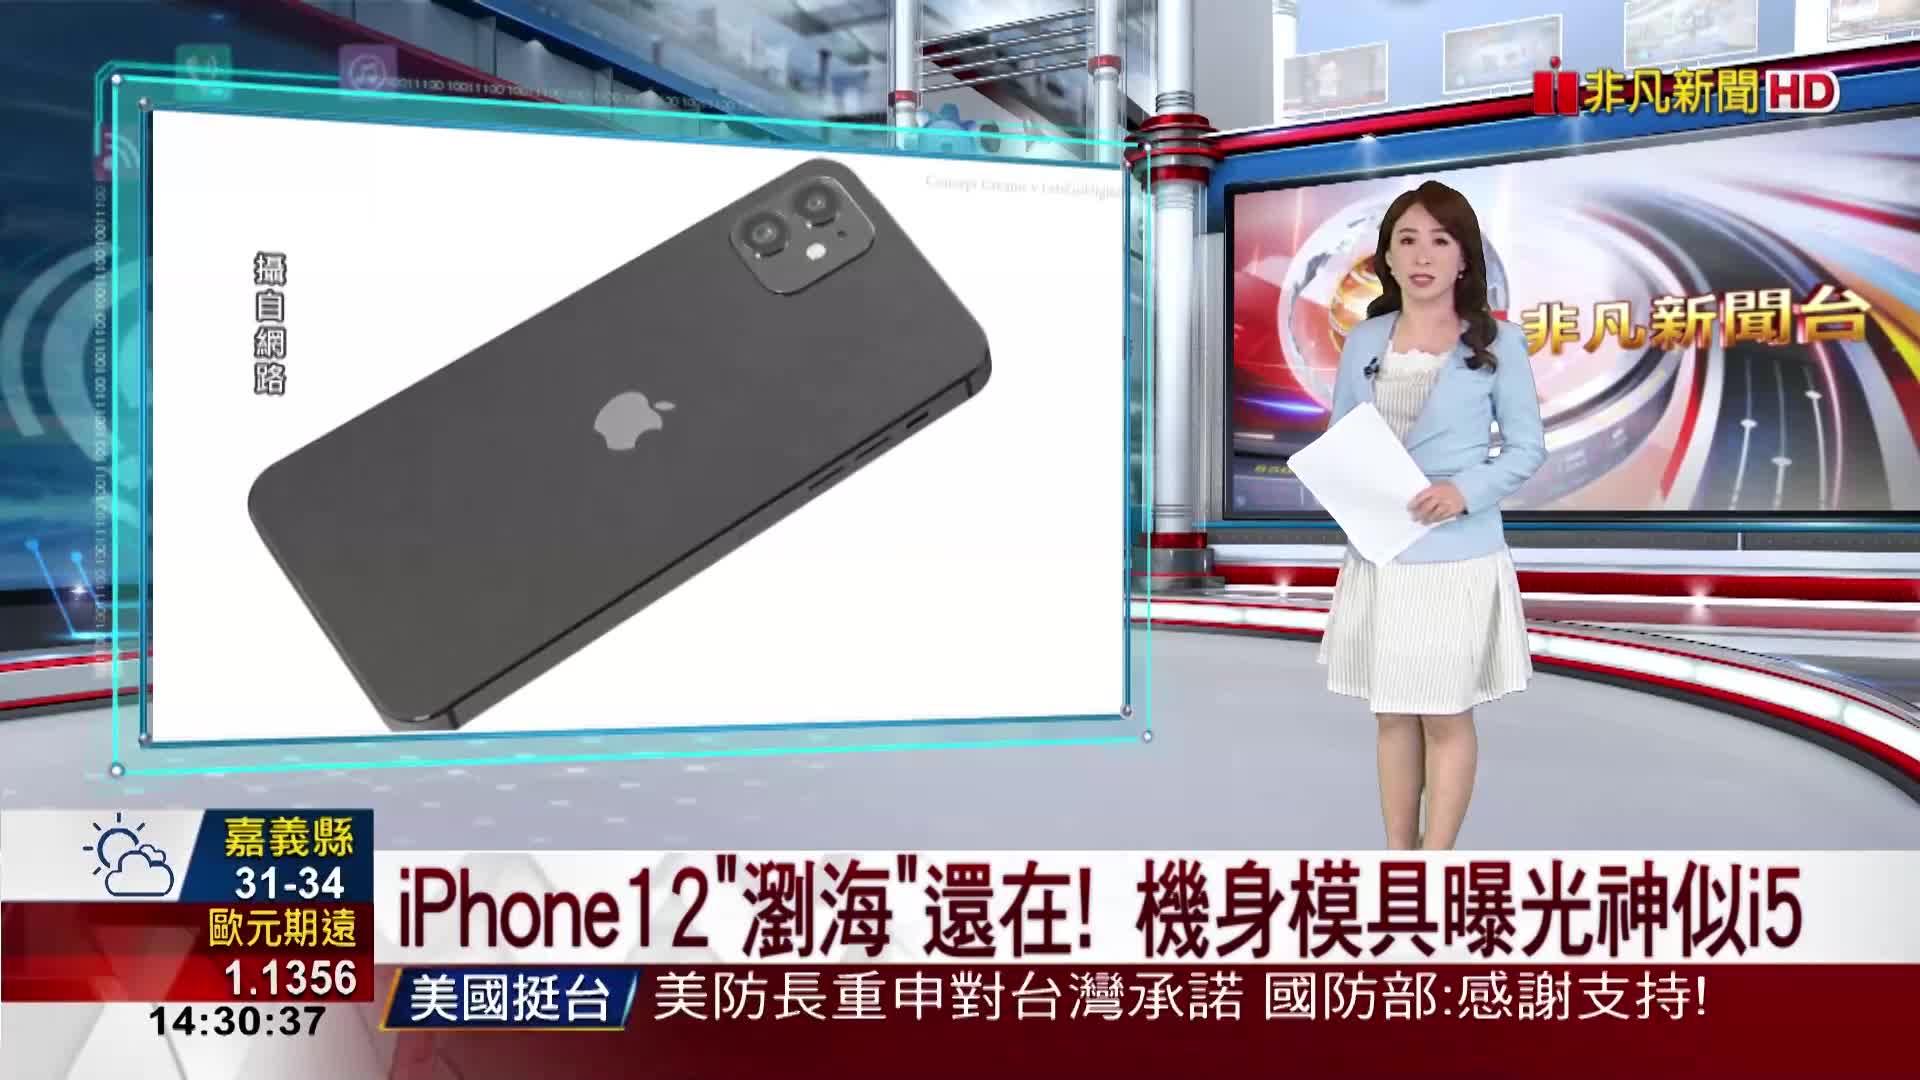 iPhone12瀏海還在! 機身模具曝光神似i5